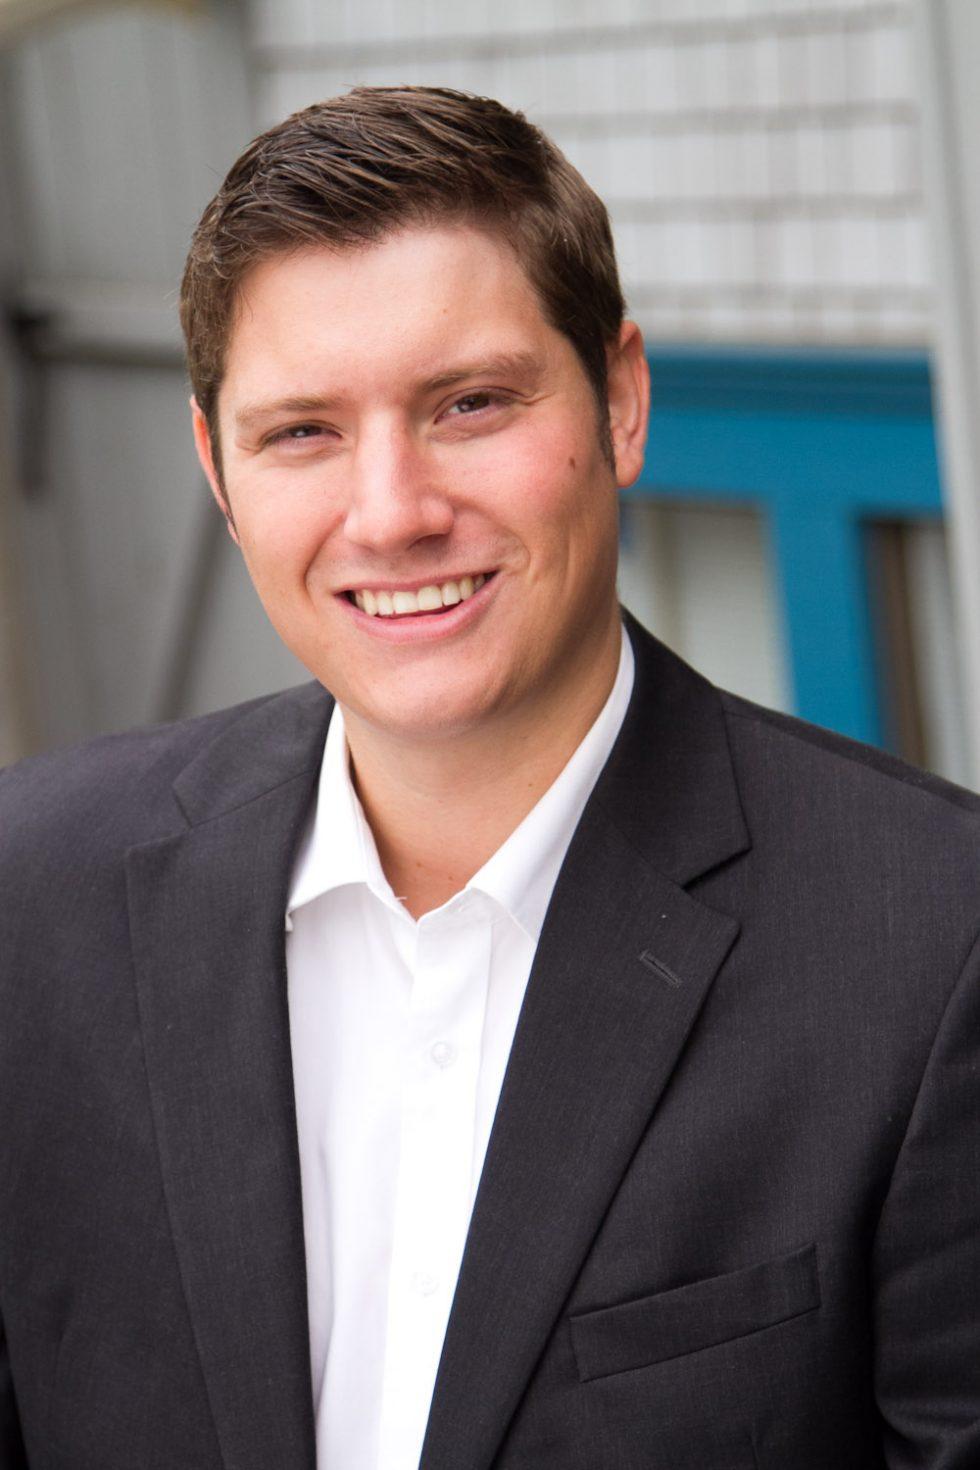 Employee Spotlight: David Joyce